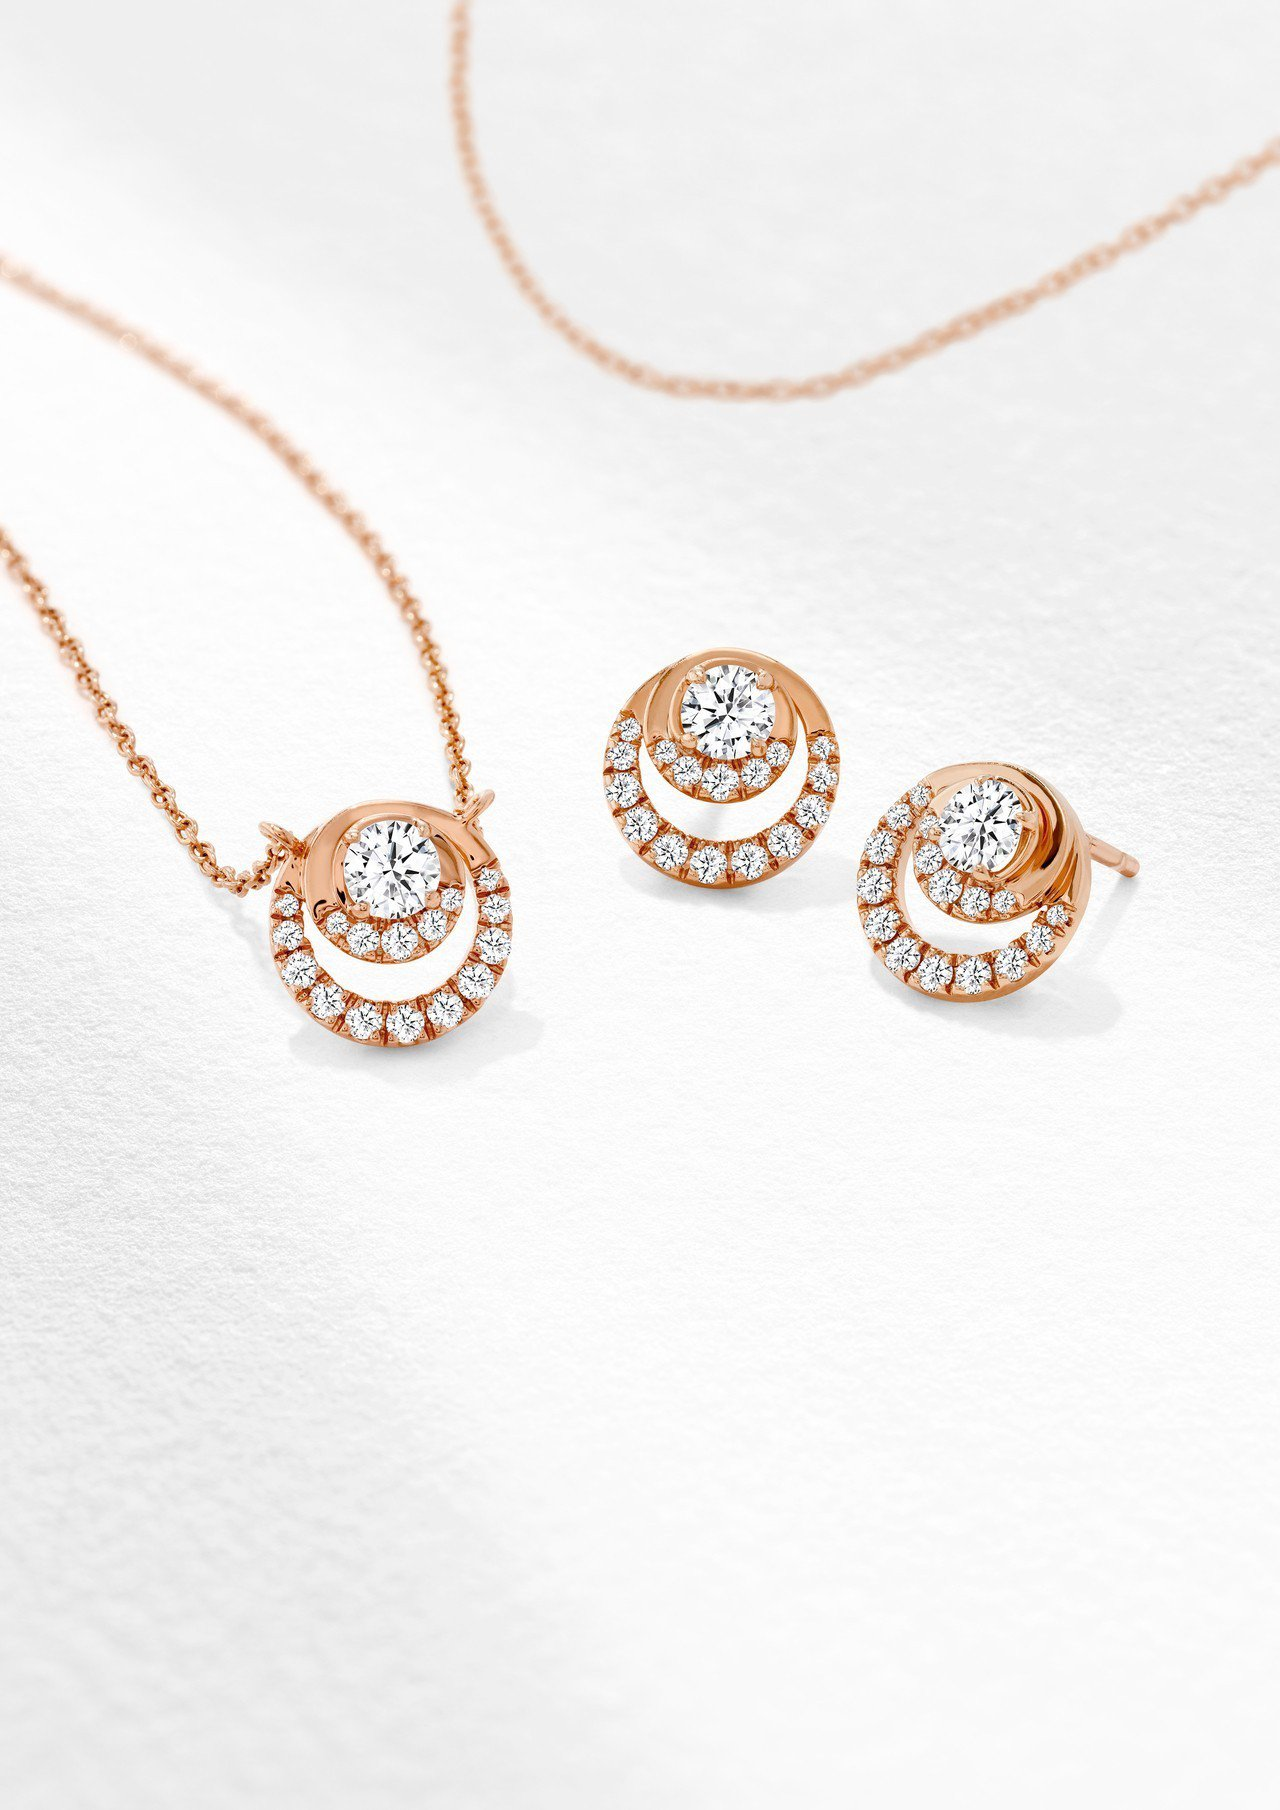 Optima 項鍊,玫瑰金鑲嵌鑽石總重0.38克拉,77,000元;Optima...